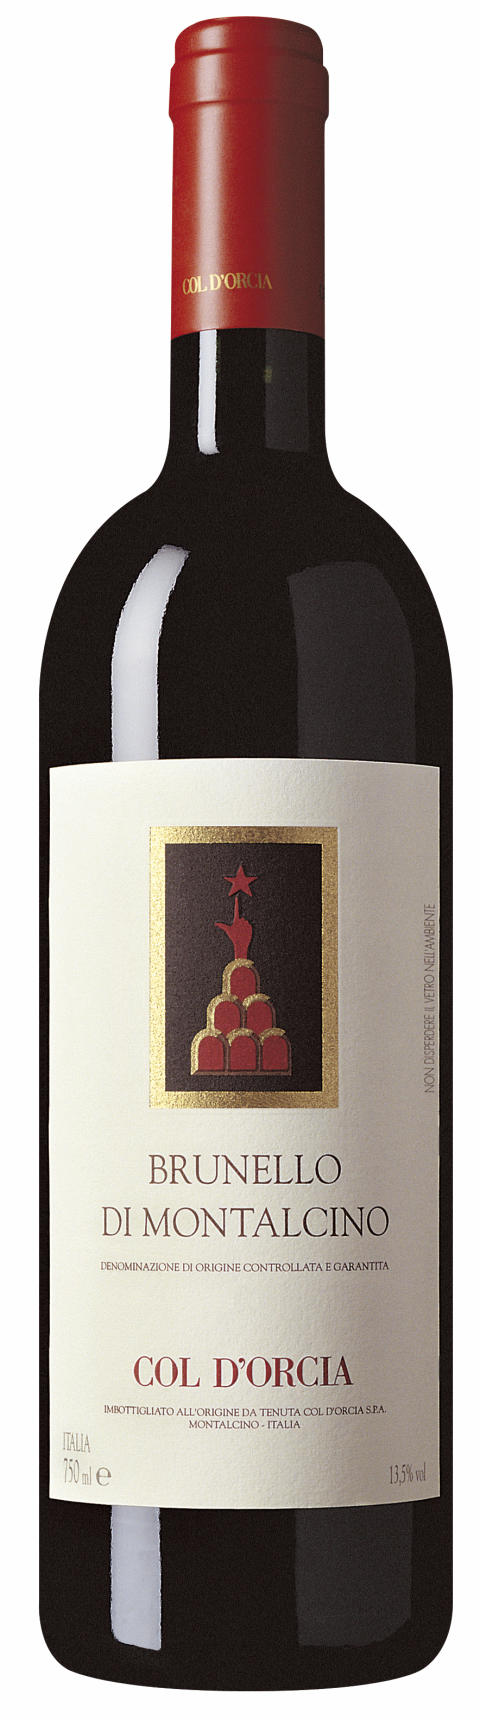 """Årets bästa röda vin"" - Col d'Orcia Brunello di Montalcino 2010"